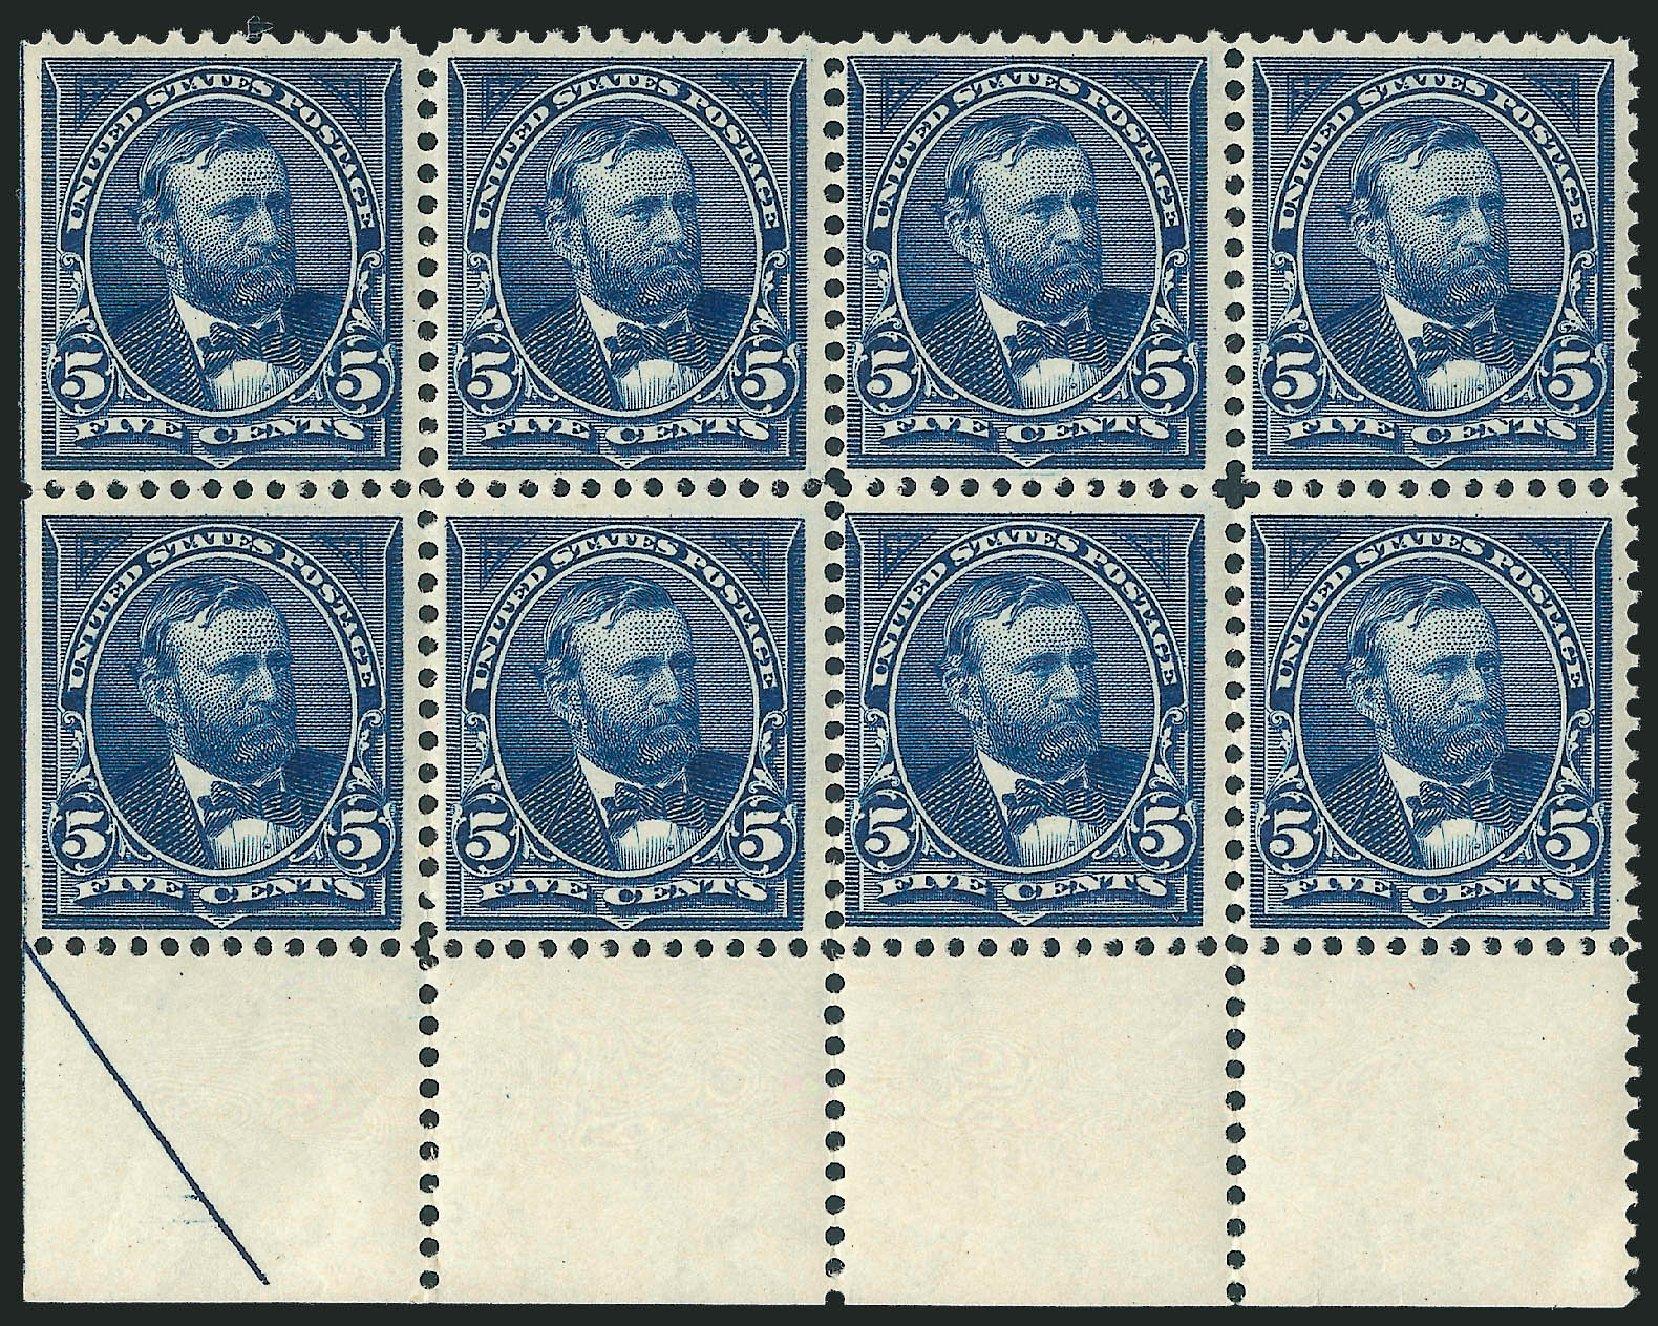 Values of US Stamp Scott Catalog 281 - 5c 1898 Grant. Robert Siegel Auction Galleries, Dec 2011, Sale 1017, Lot 698